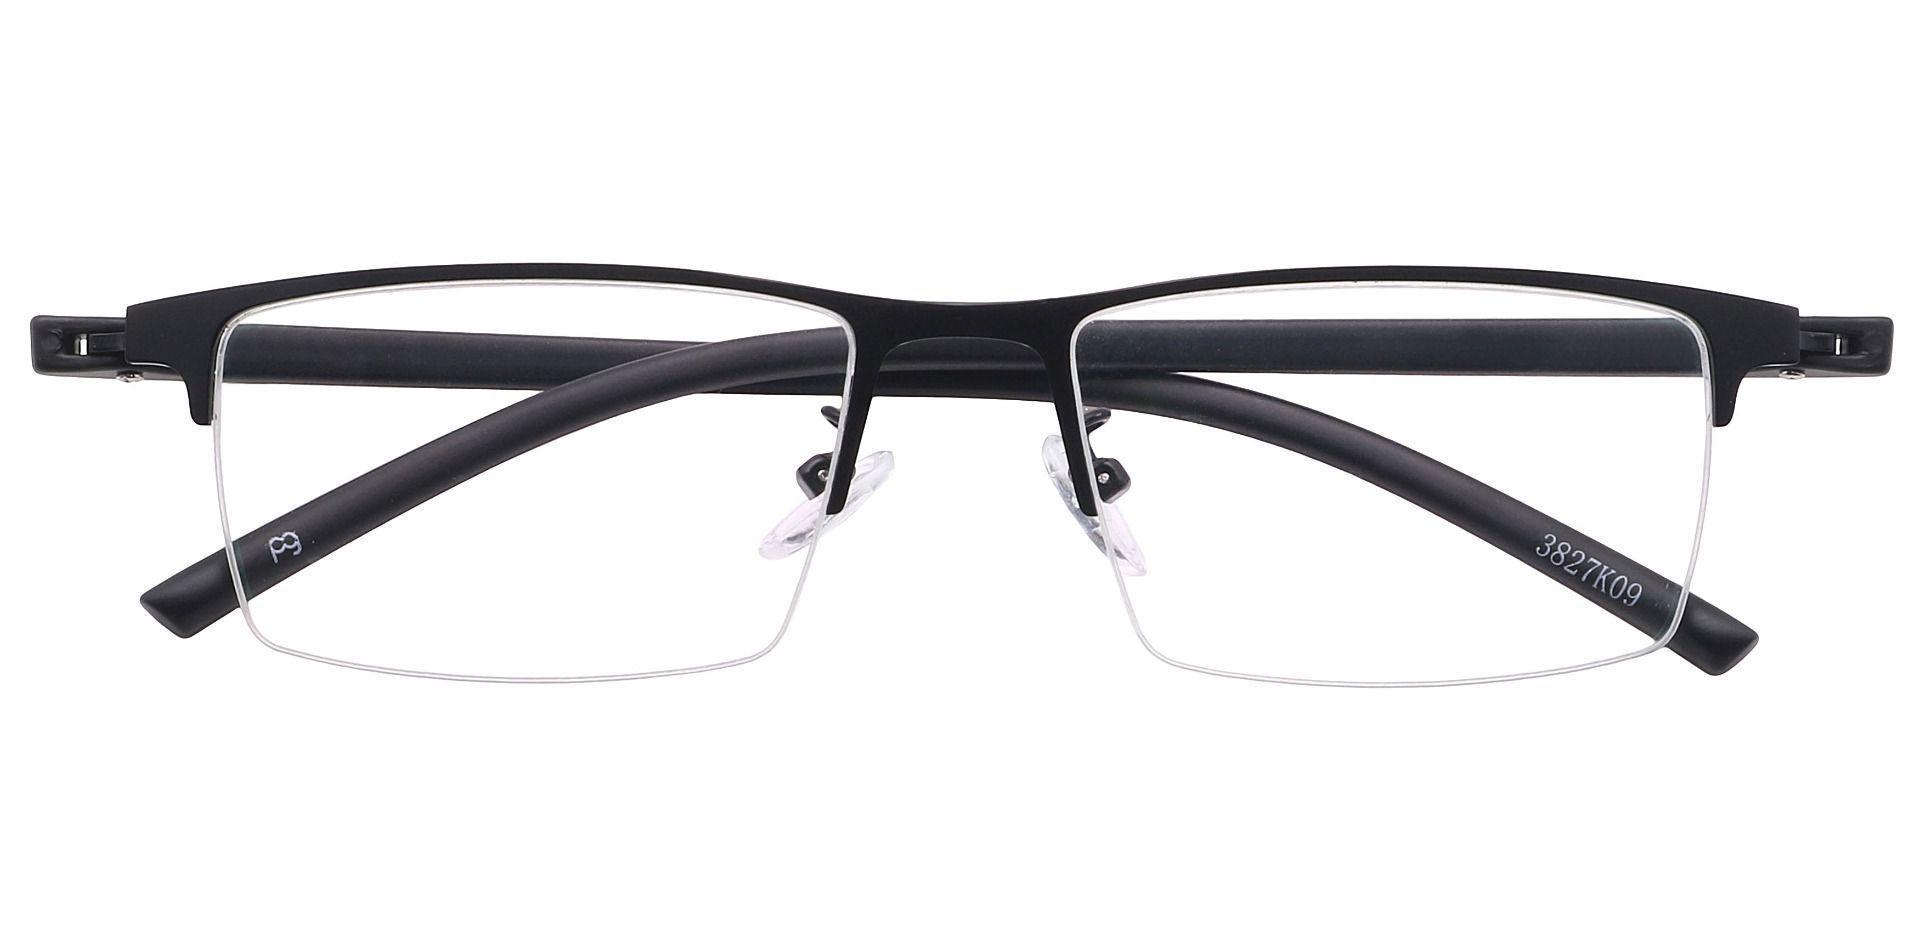 Haskell Rectangle Prescription Glasses - Black